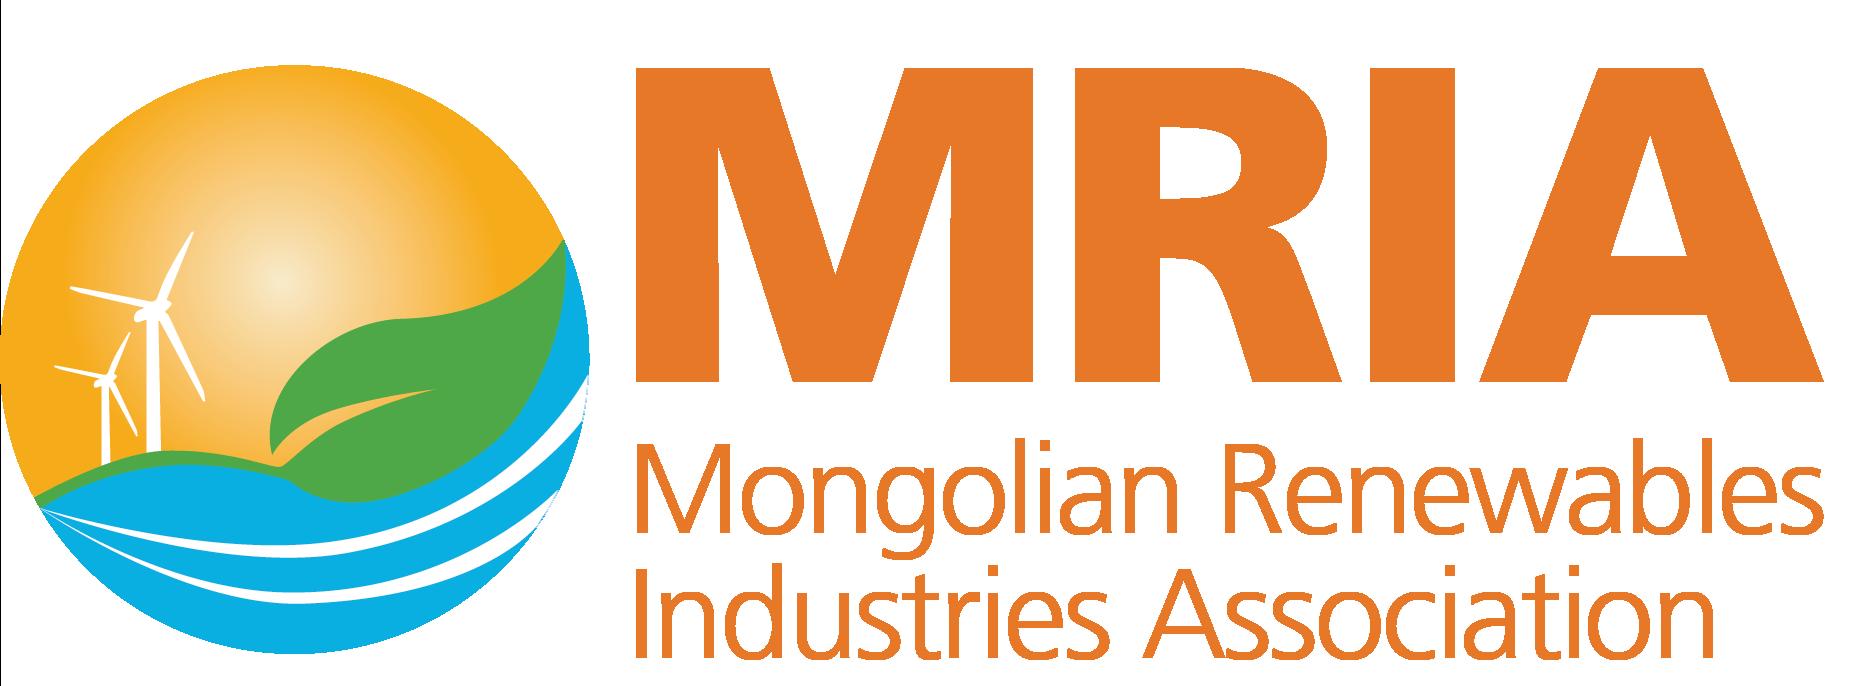 Mongolian Renewables Industries Association